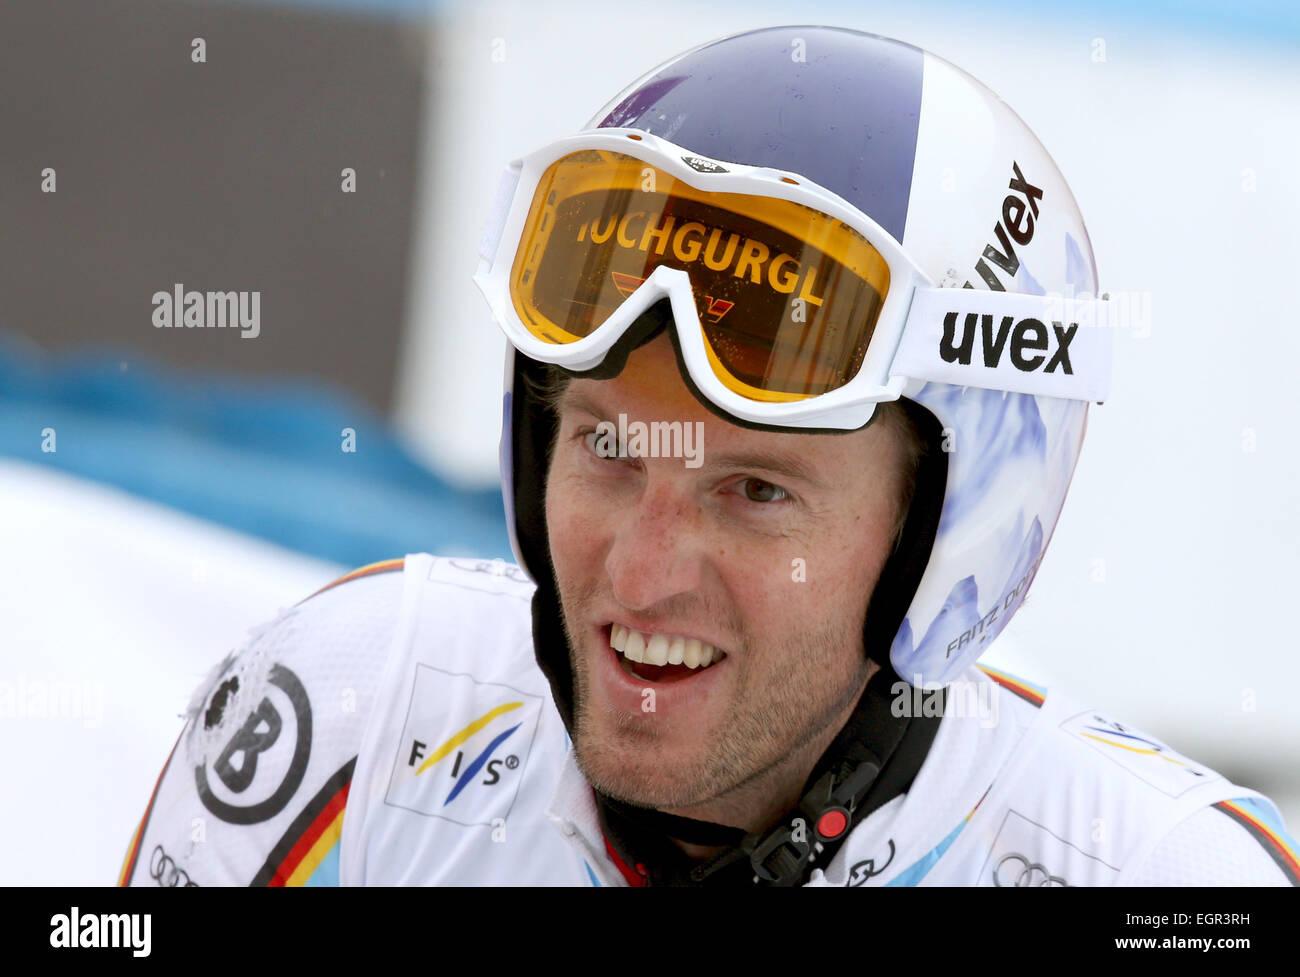 Garmisch-Partenkirchen, Germany. 01st Mar, 2015. Fritz Dopfer of Germany on the first run at the Men's Giant Slalom Stock Photo